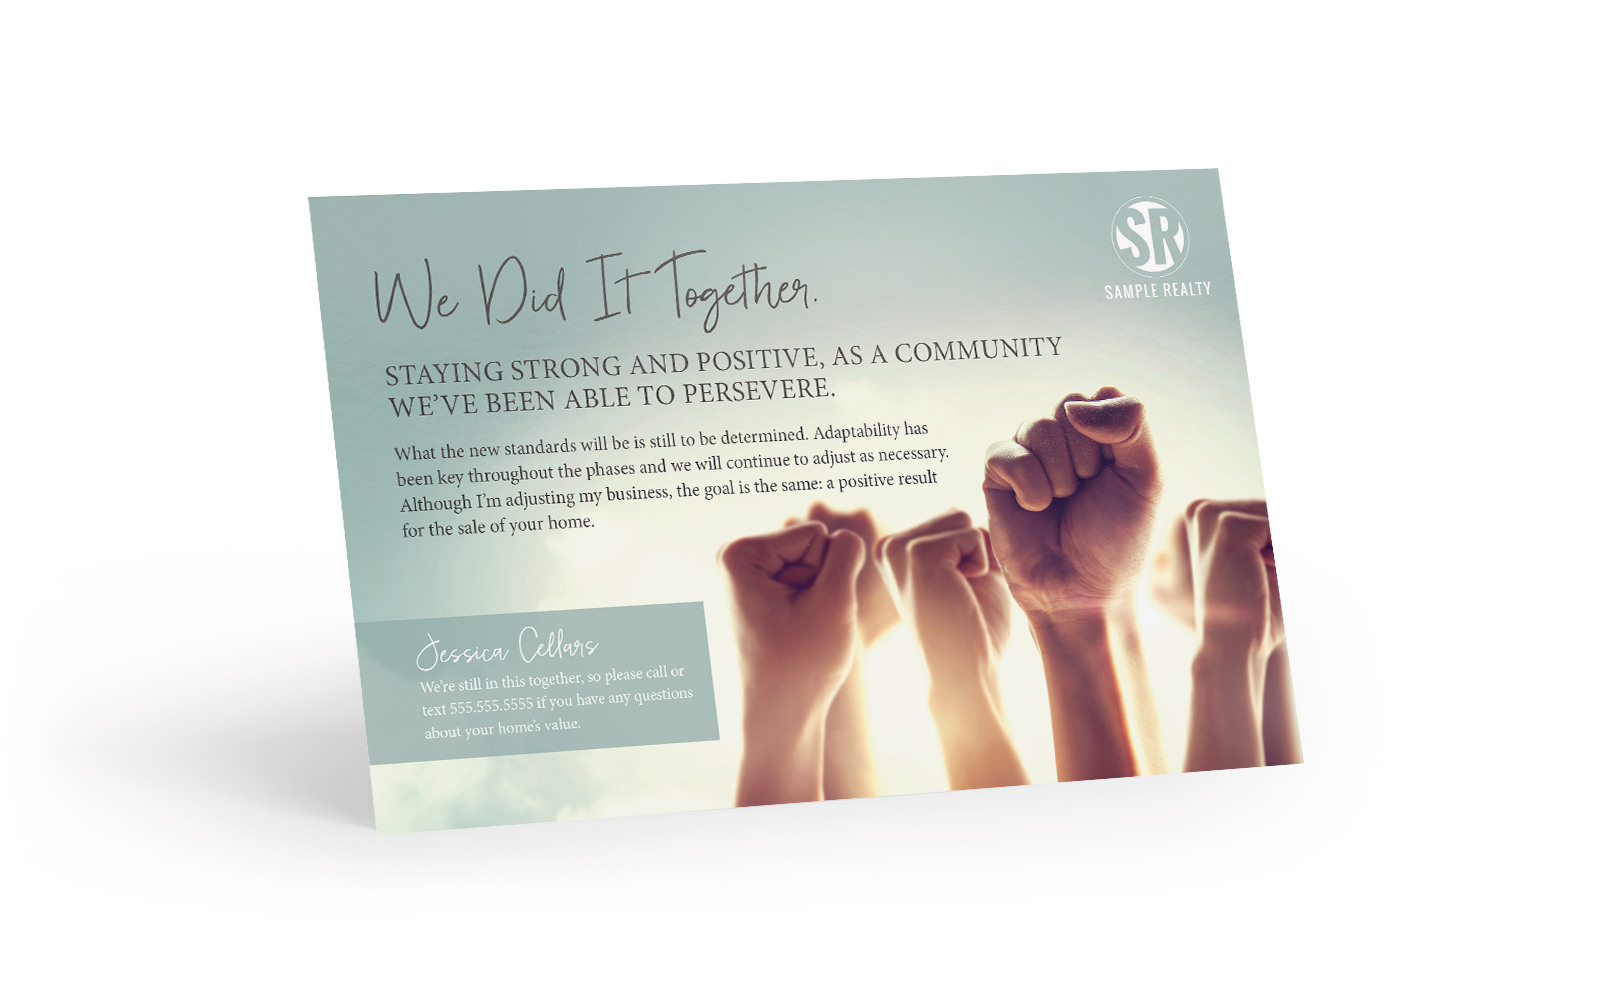 Corefact Restart - We Did It Together